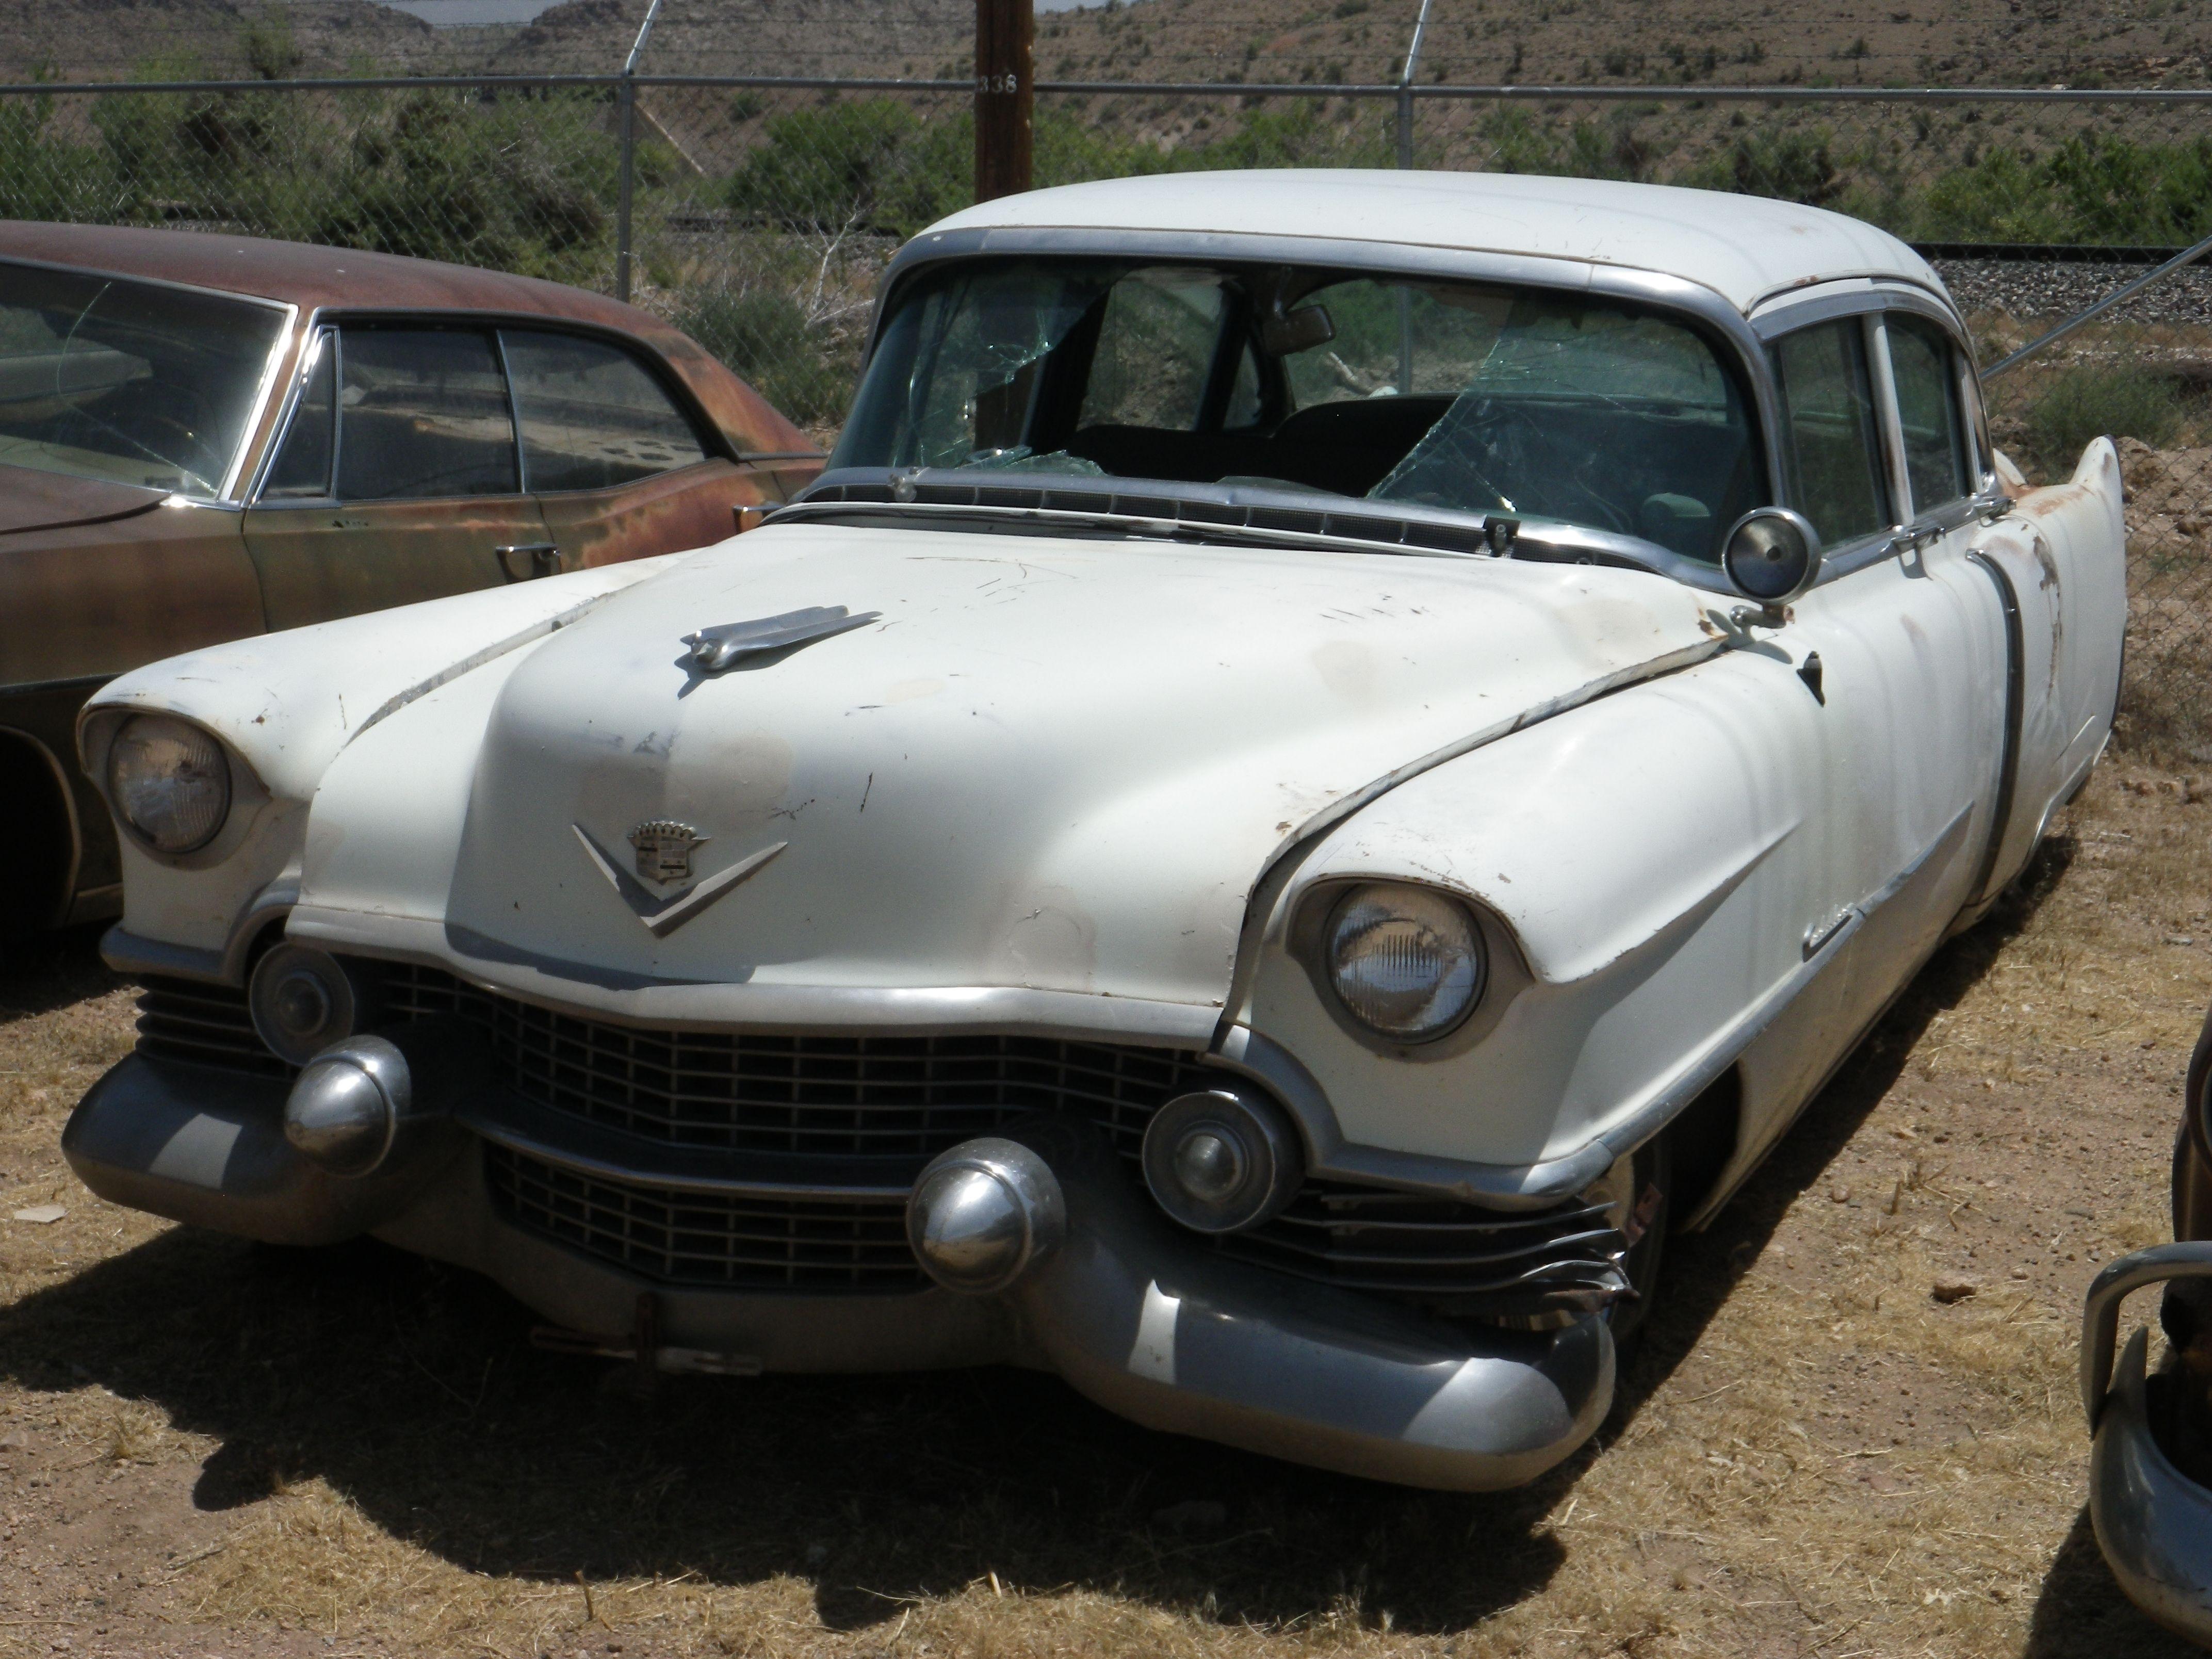 cadillac eldo s for hailey jim cars fleetwood sale classic